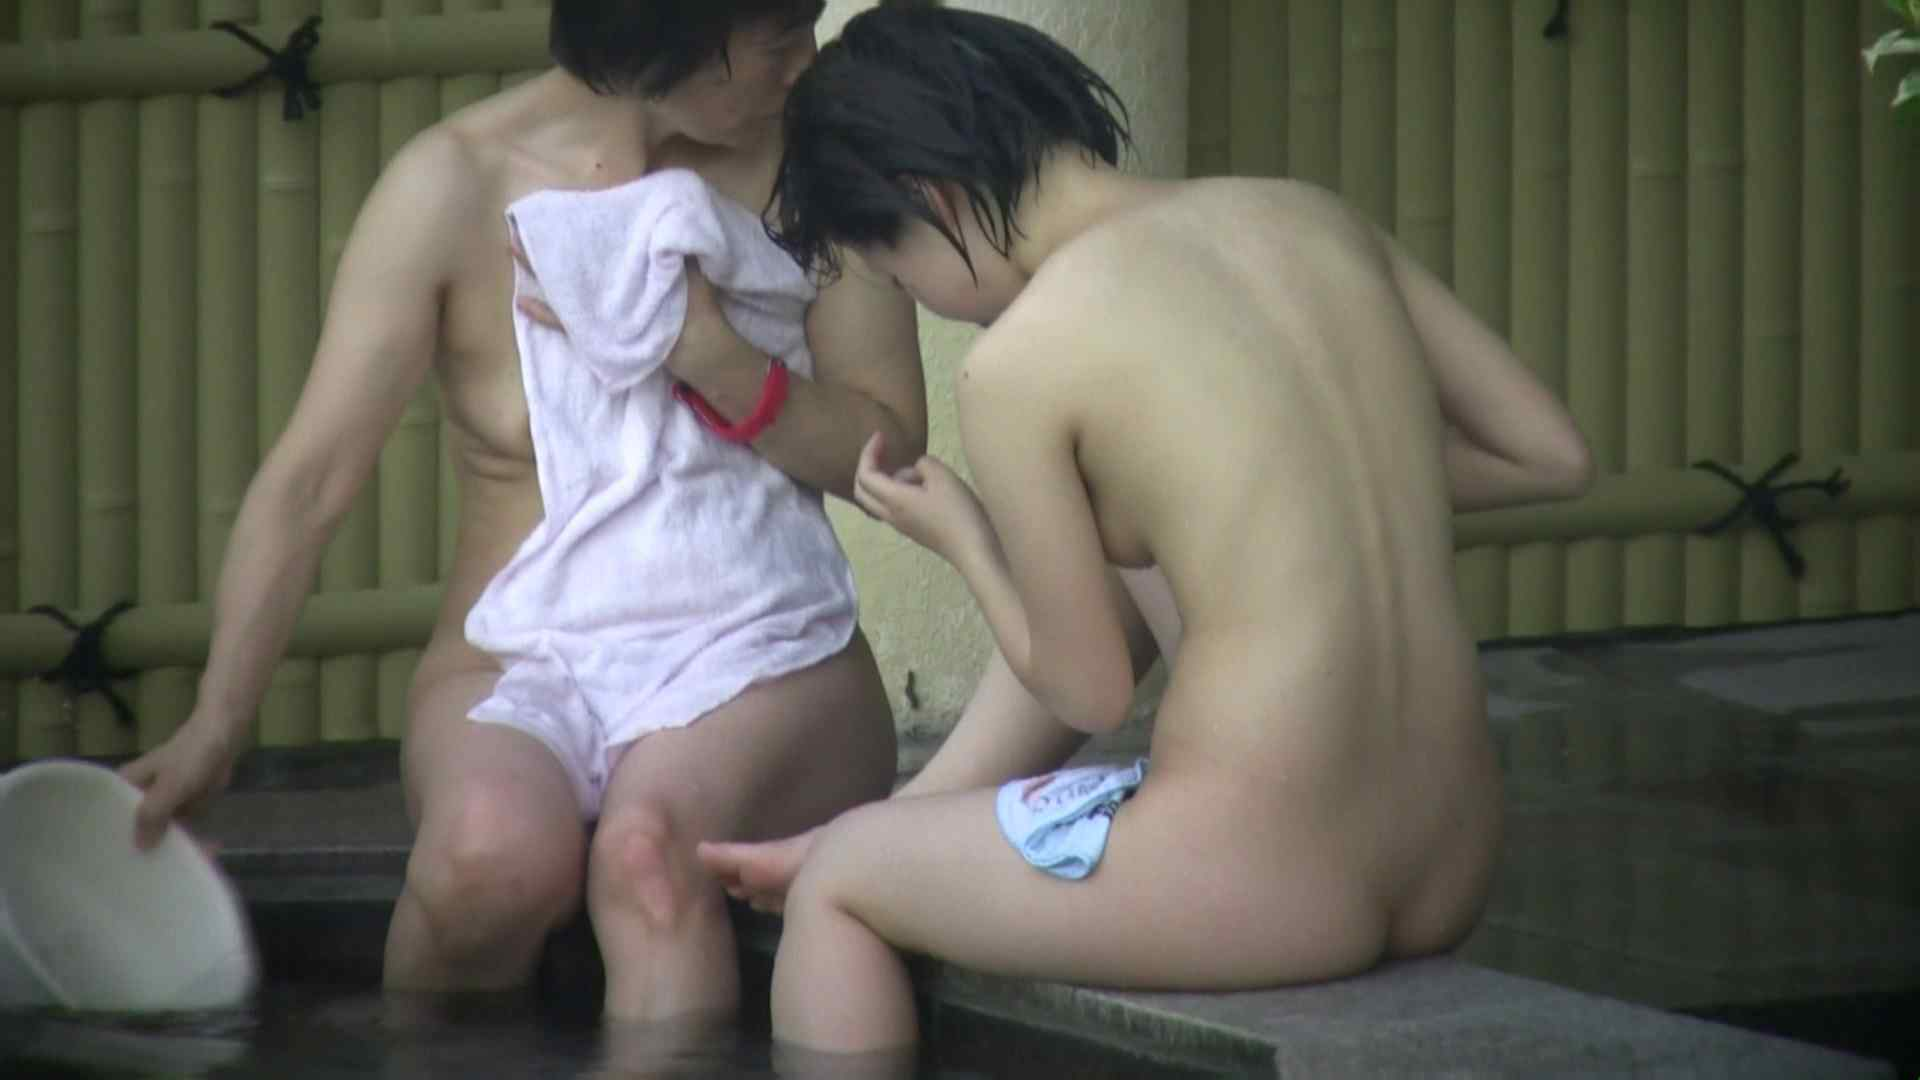 Aquaな露天風呂Vol.06【VIP】 HなOL | 盗撮  86pic 53